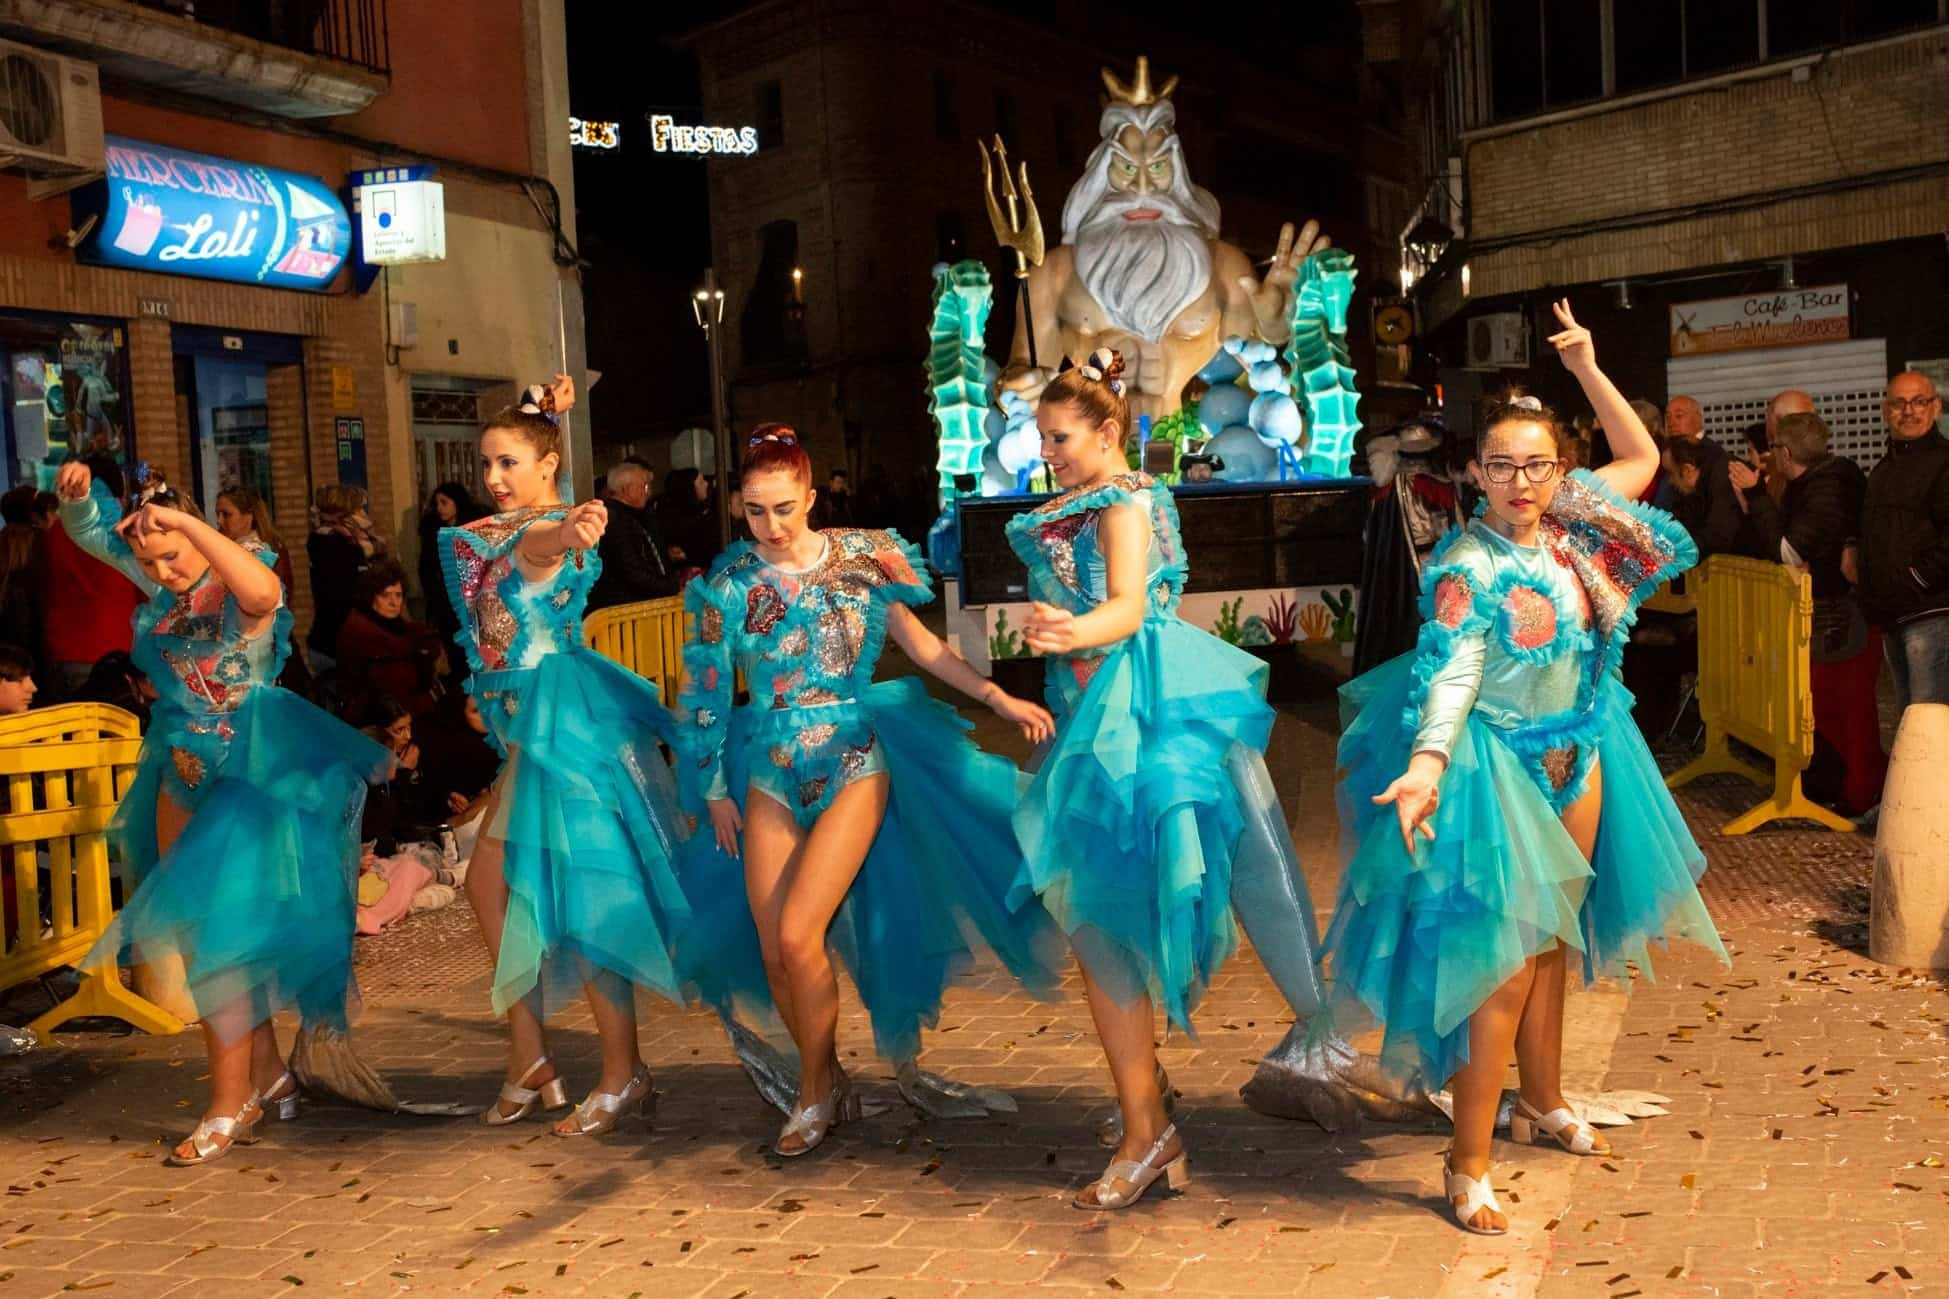 Carnaval de herencia 2020 ofertorio 115 - Selección de fotografías del Ofertorio del Carnaval de Herencia